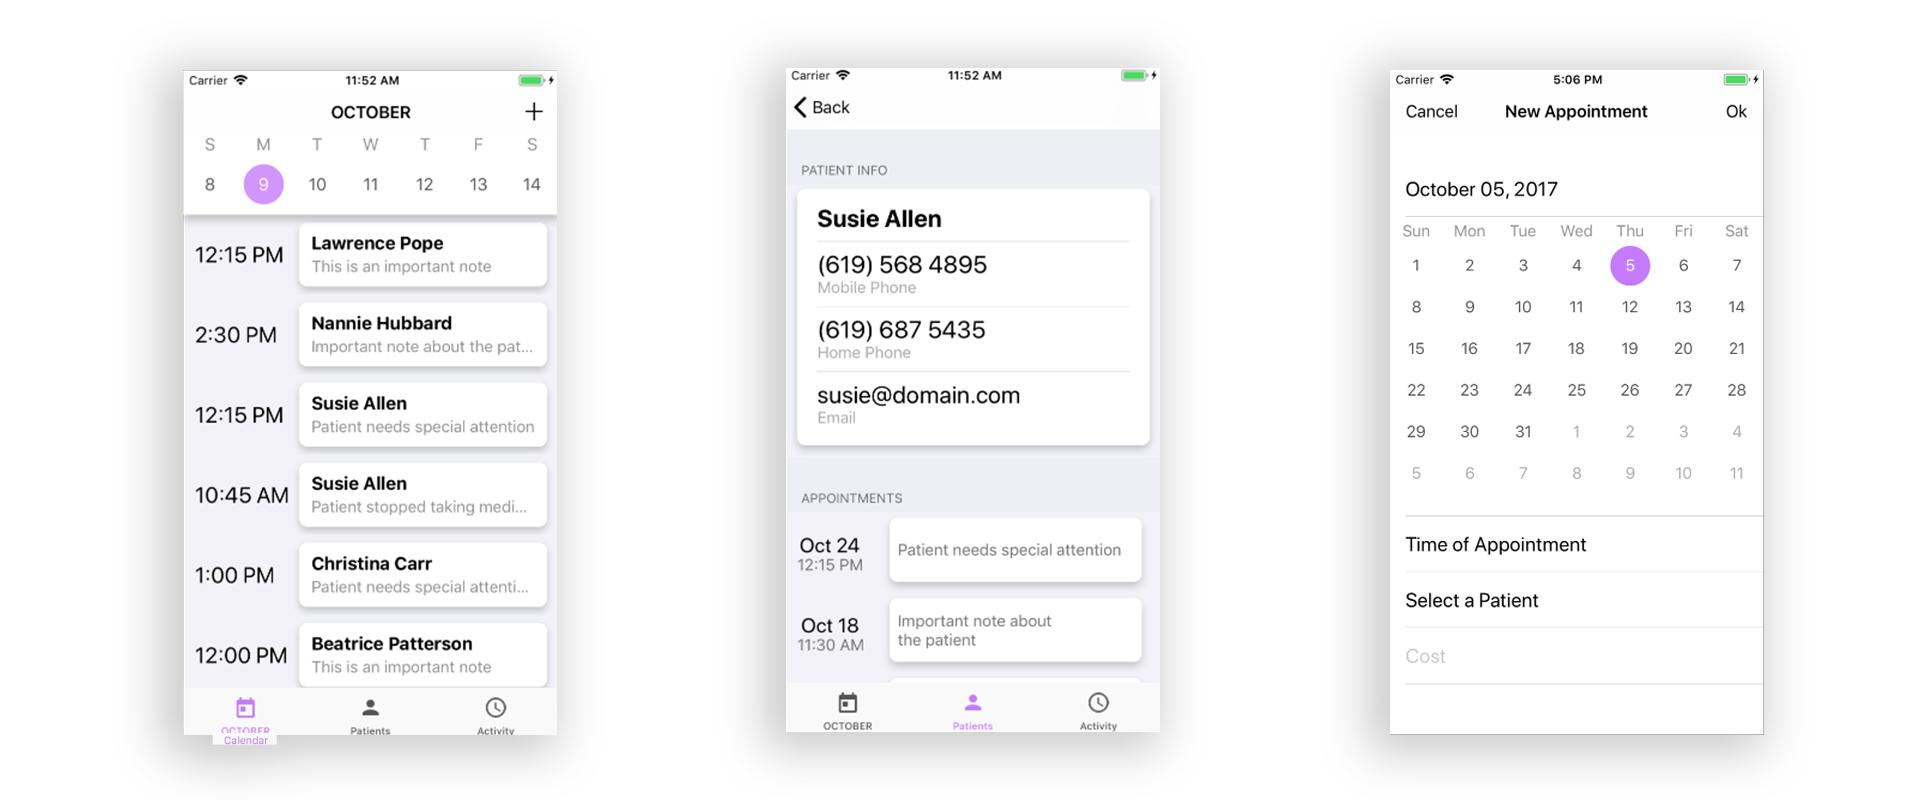 GitHub - agustinoromo/calendar-iOS: Appointment Scheduling Calendar